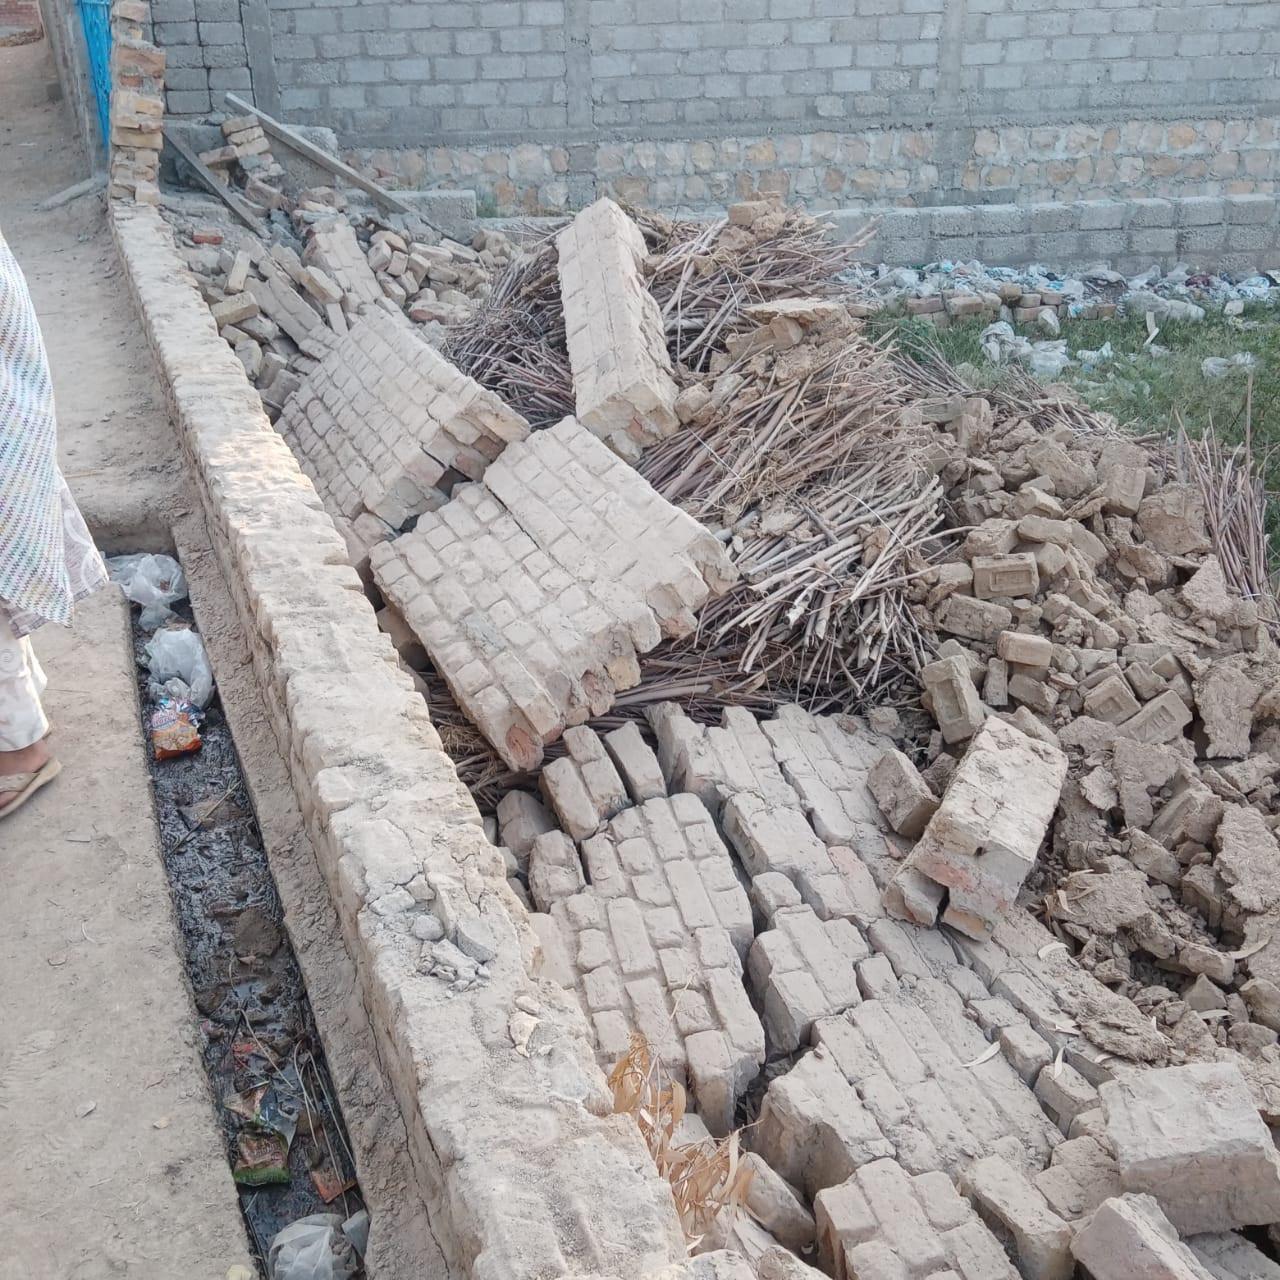 At least 20 killed as magnitude 5.9 earthquake jolts Balochistan